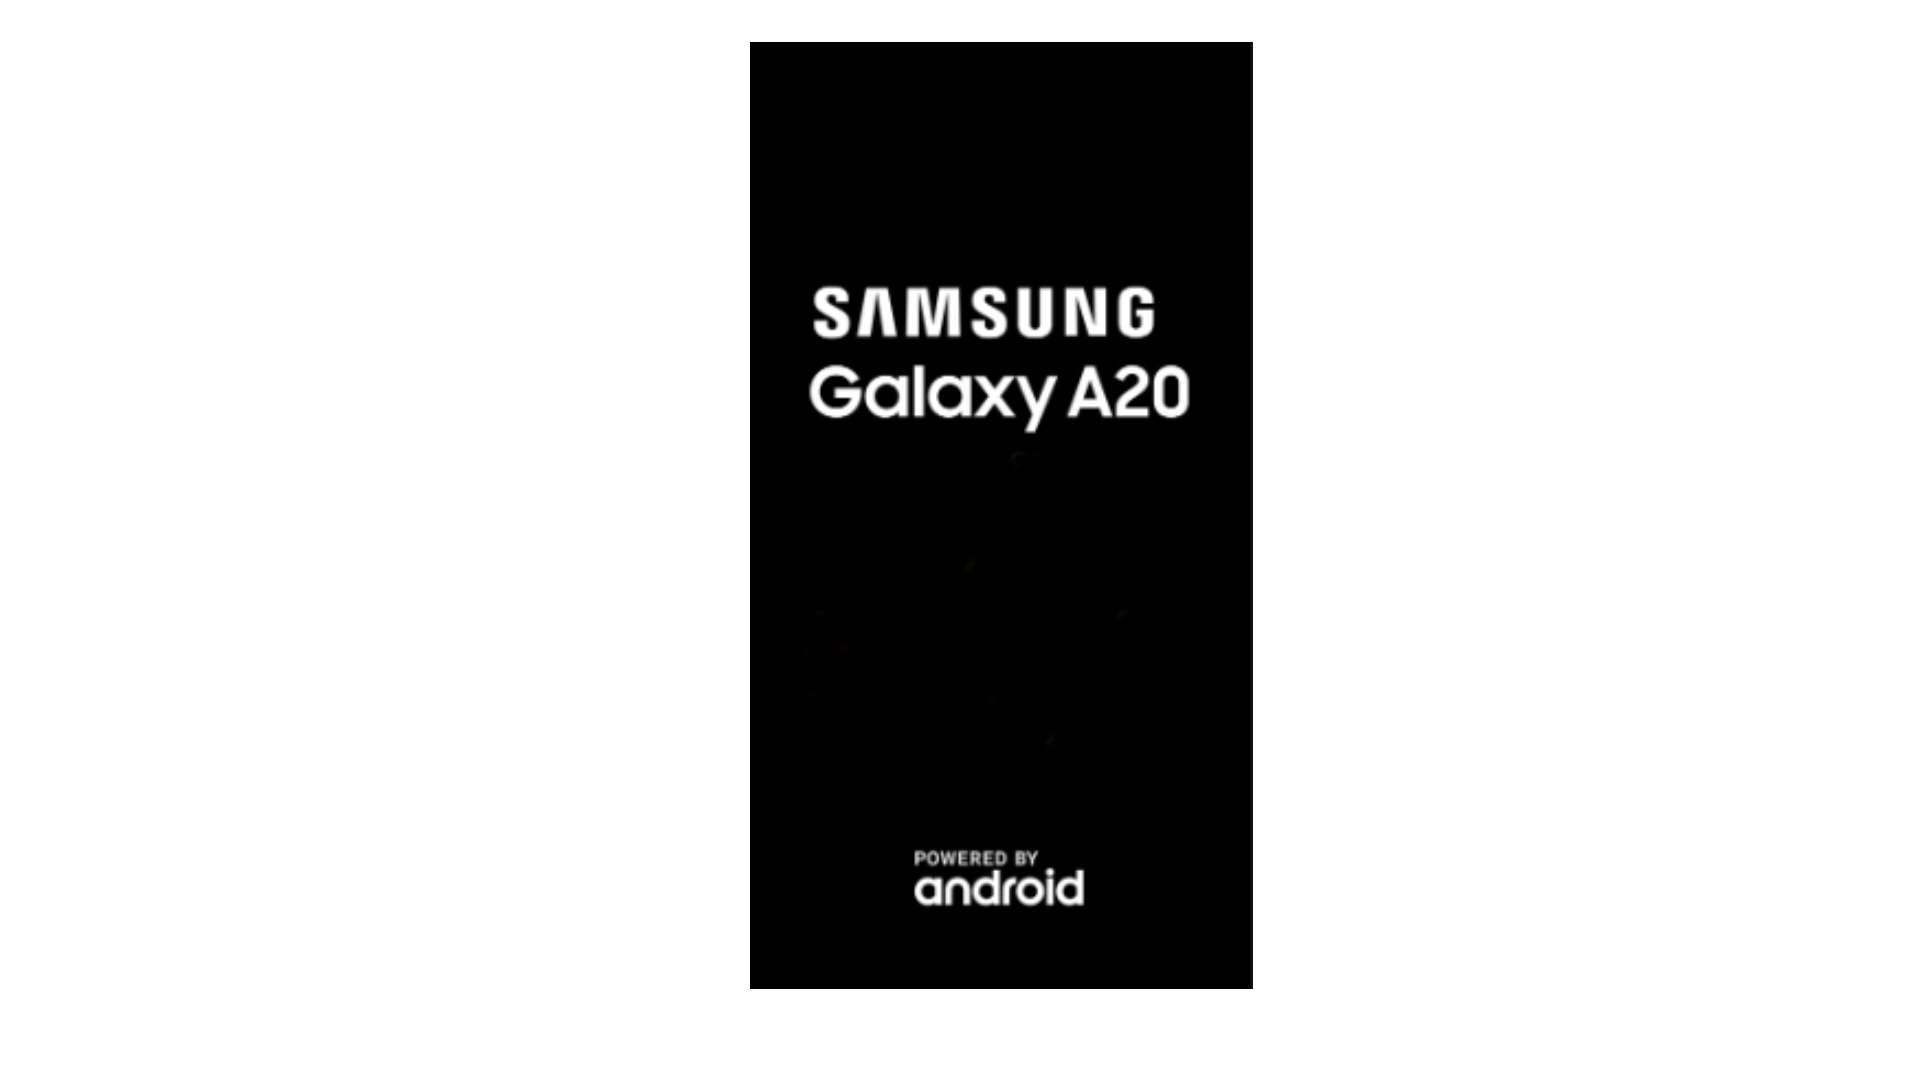 galaxy a20 won't charge